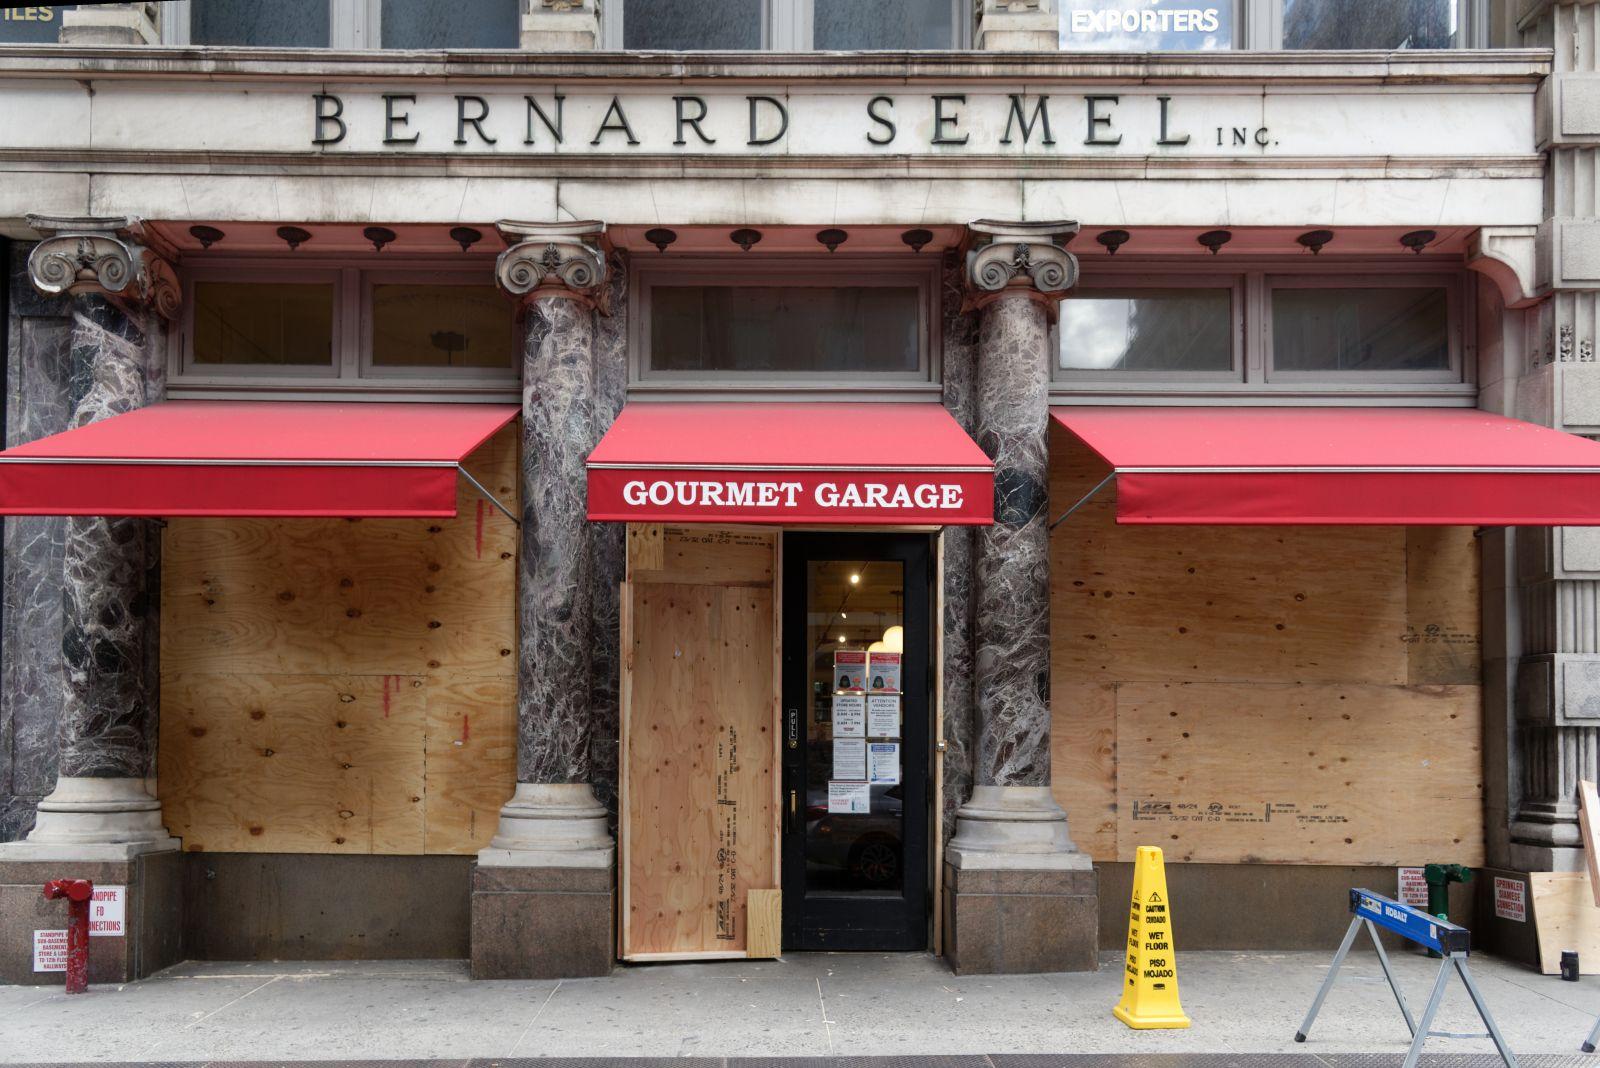 Gourmet Garage Arteasan